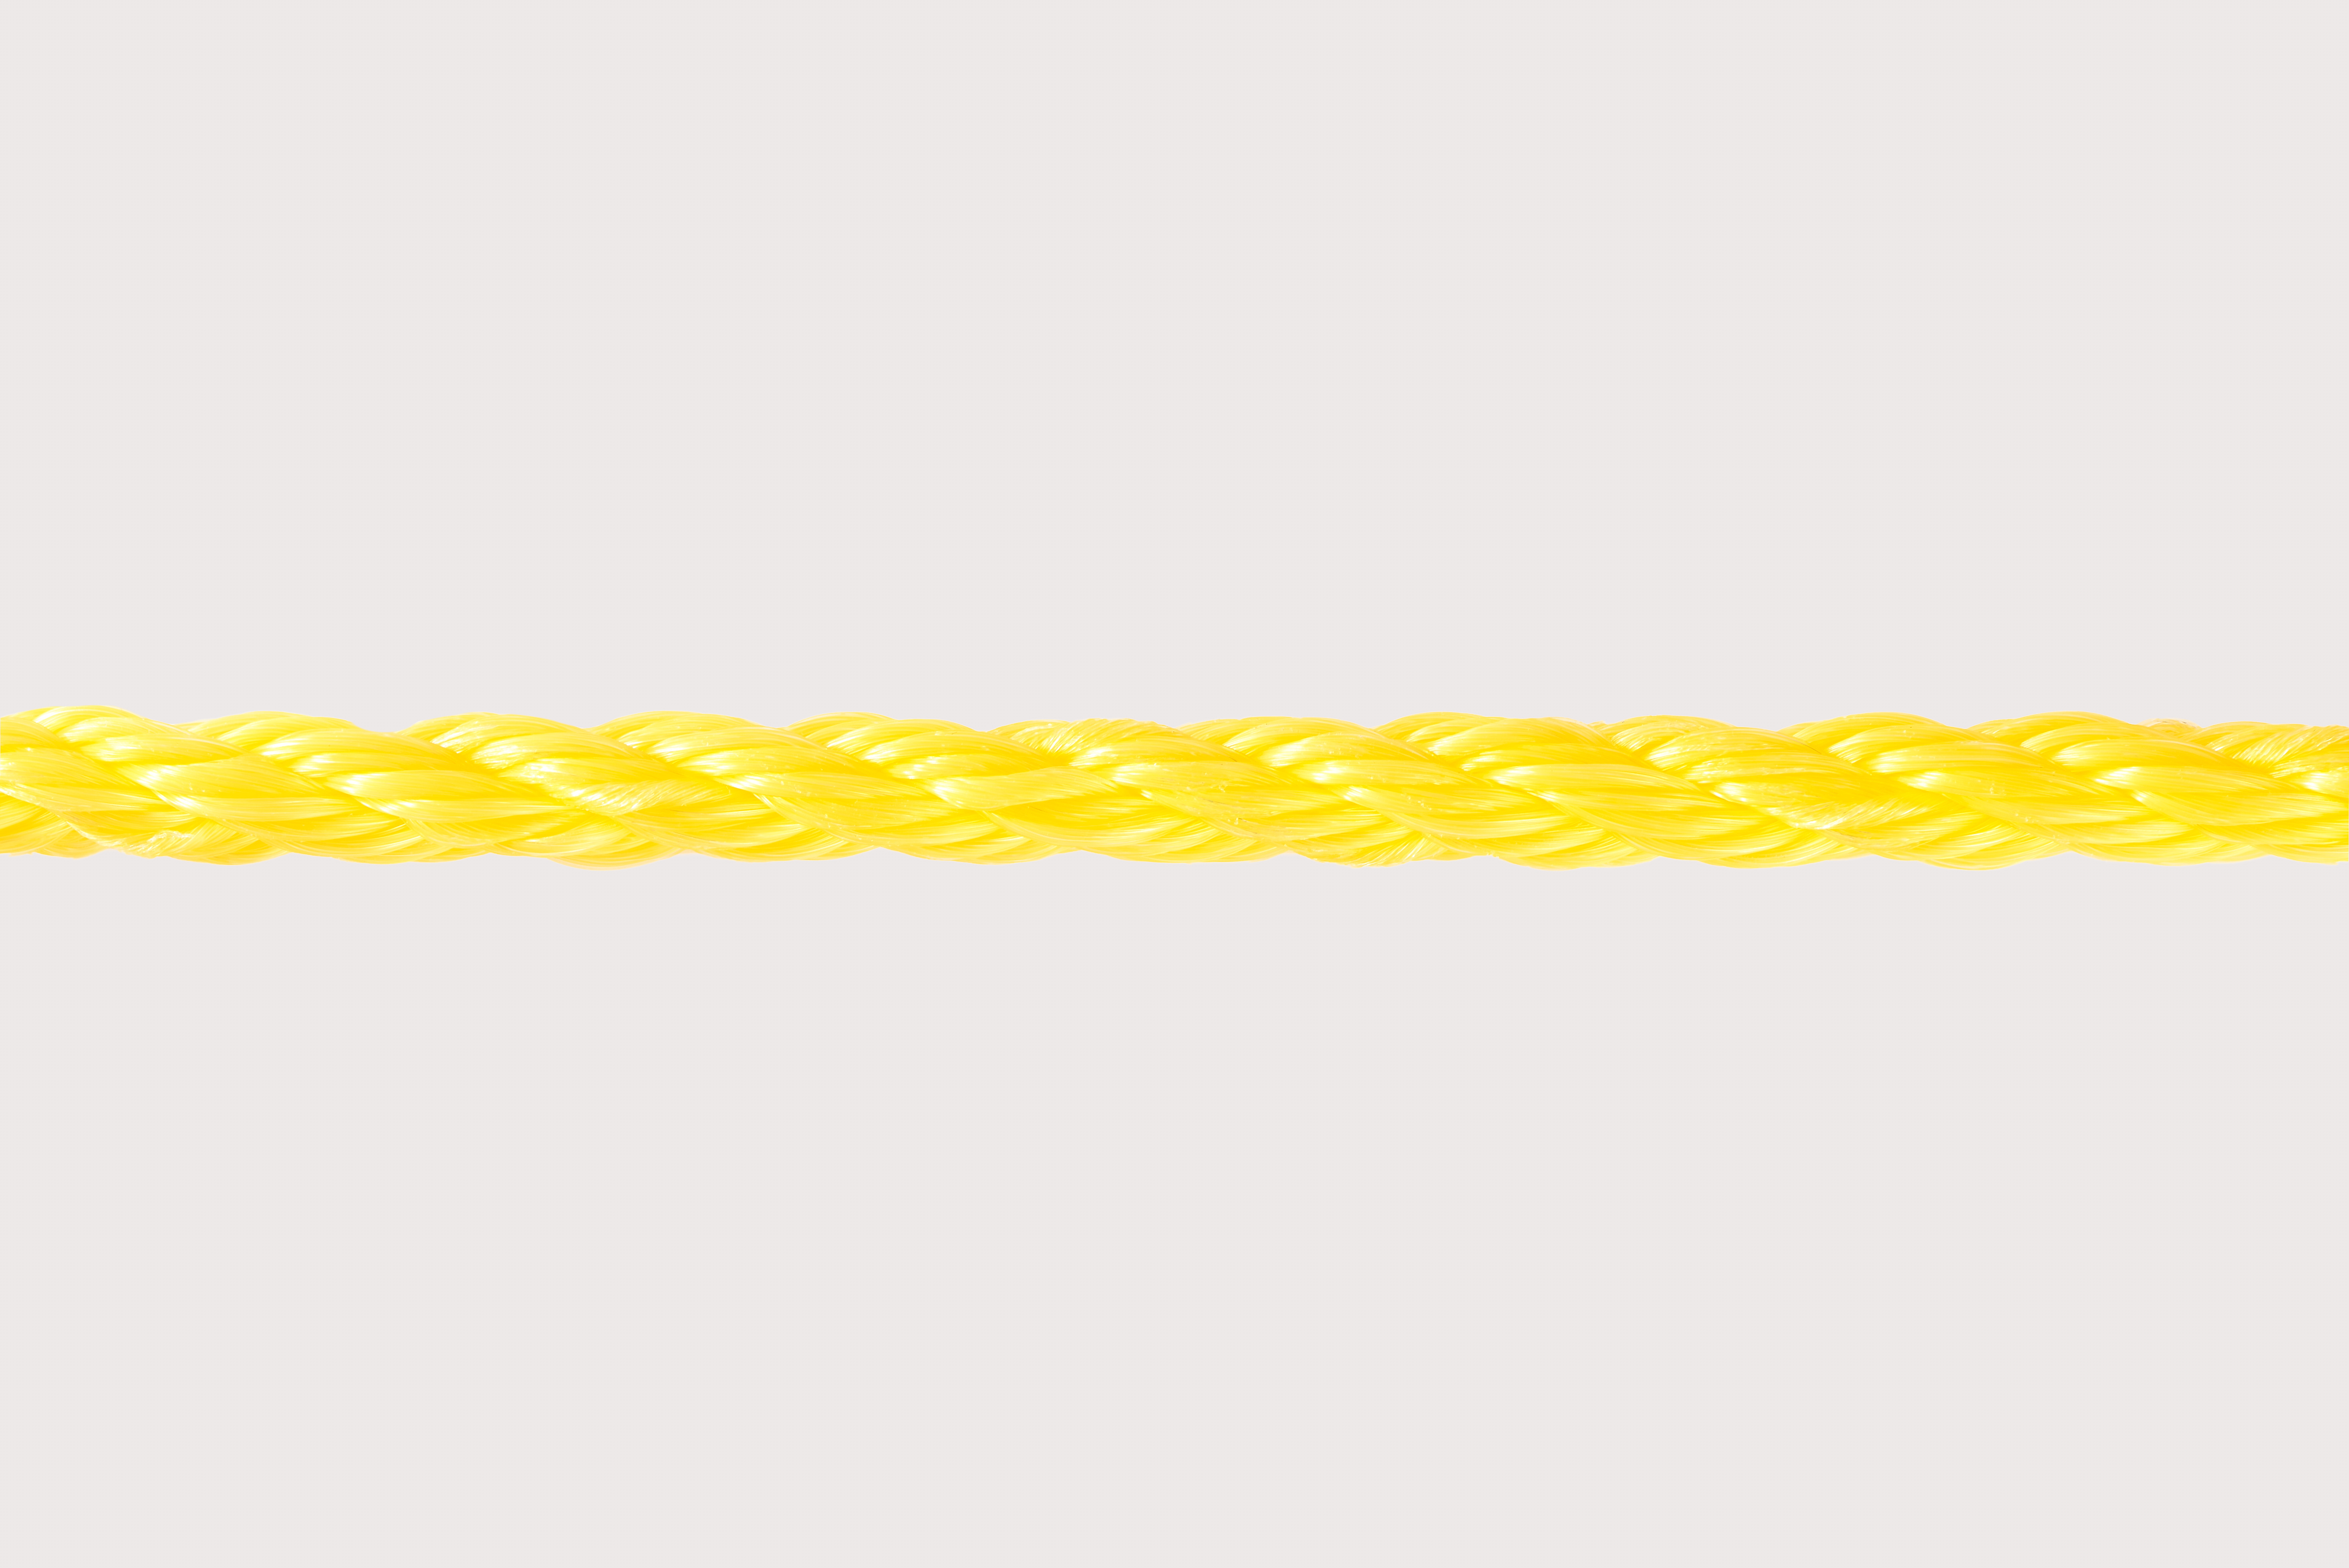 Orion-Cordage-Polylite 3-Strand Monofilament Polypropylene-Yellow-Horizontal107.jpg